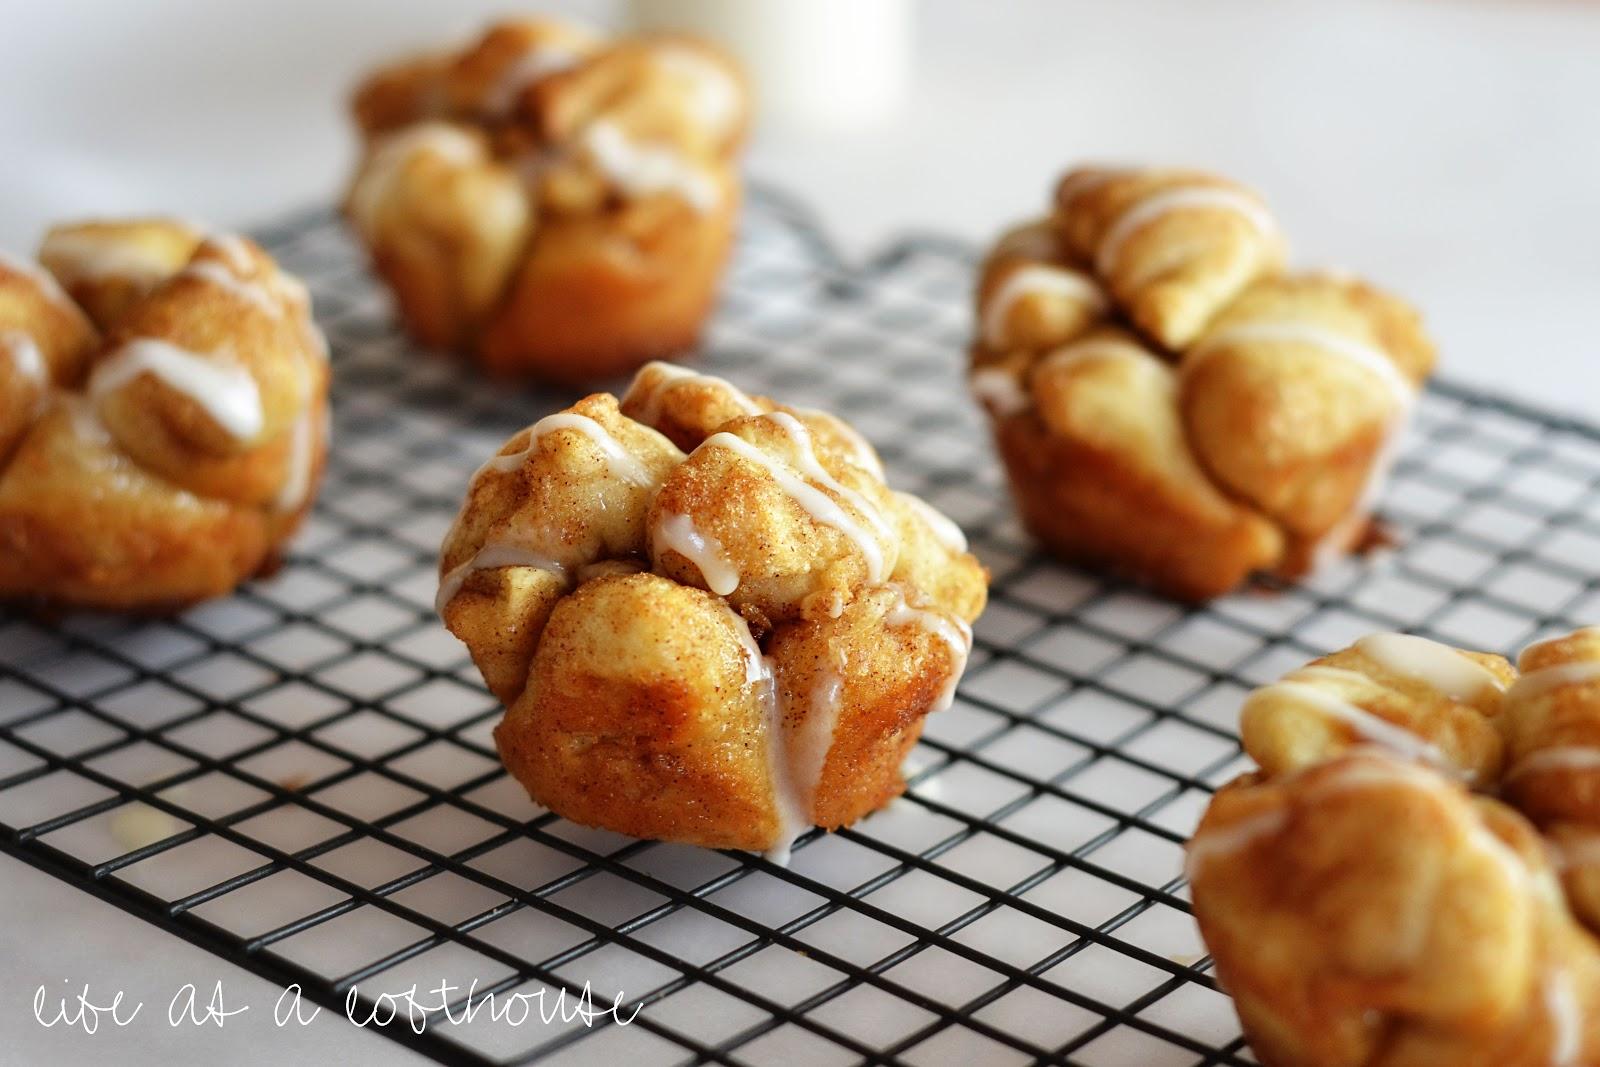 Inspiring snaps: Mini Cinnamon Monkey Rolls. Monkey Bread Muffins 3 (12 oz) pkgs refrigerated biscuit dough 1 c sugar 2 tsp cinnamon 1 c butter 1 c brown sugar Put foil liners into muffin tin.